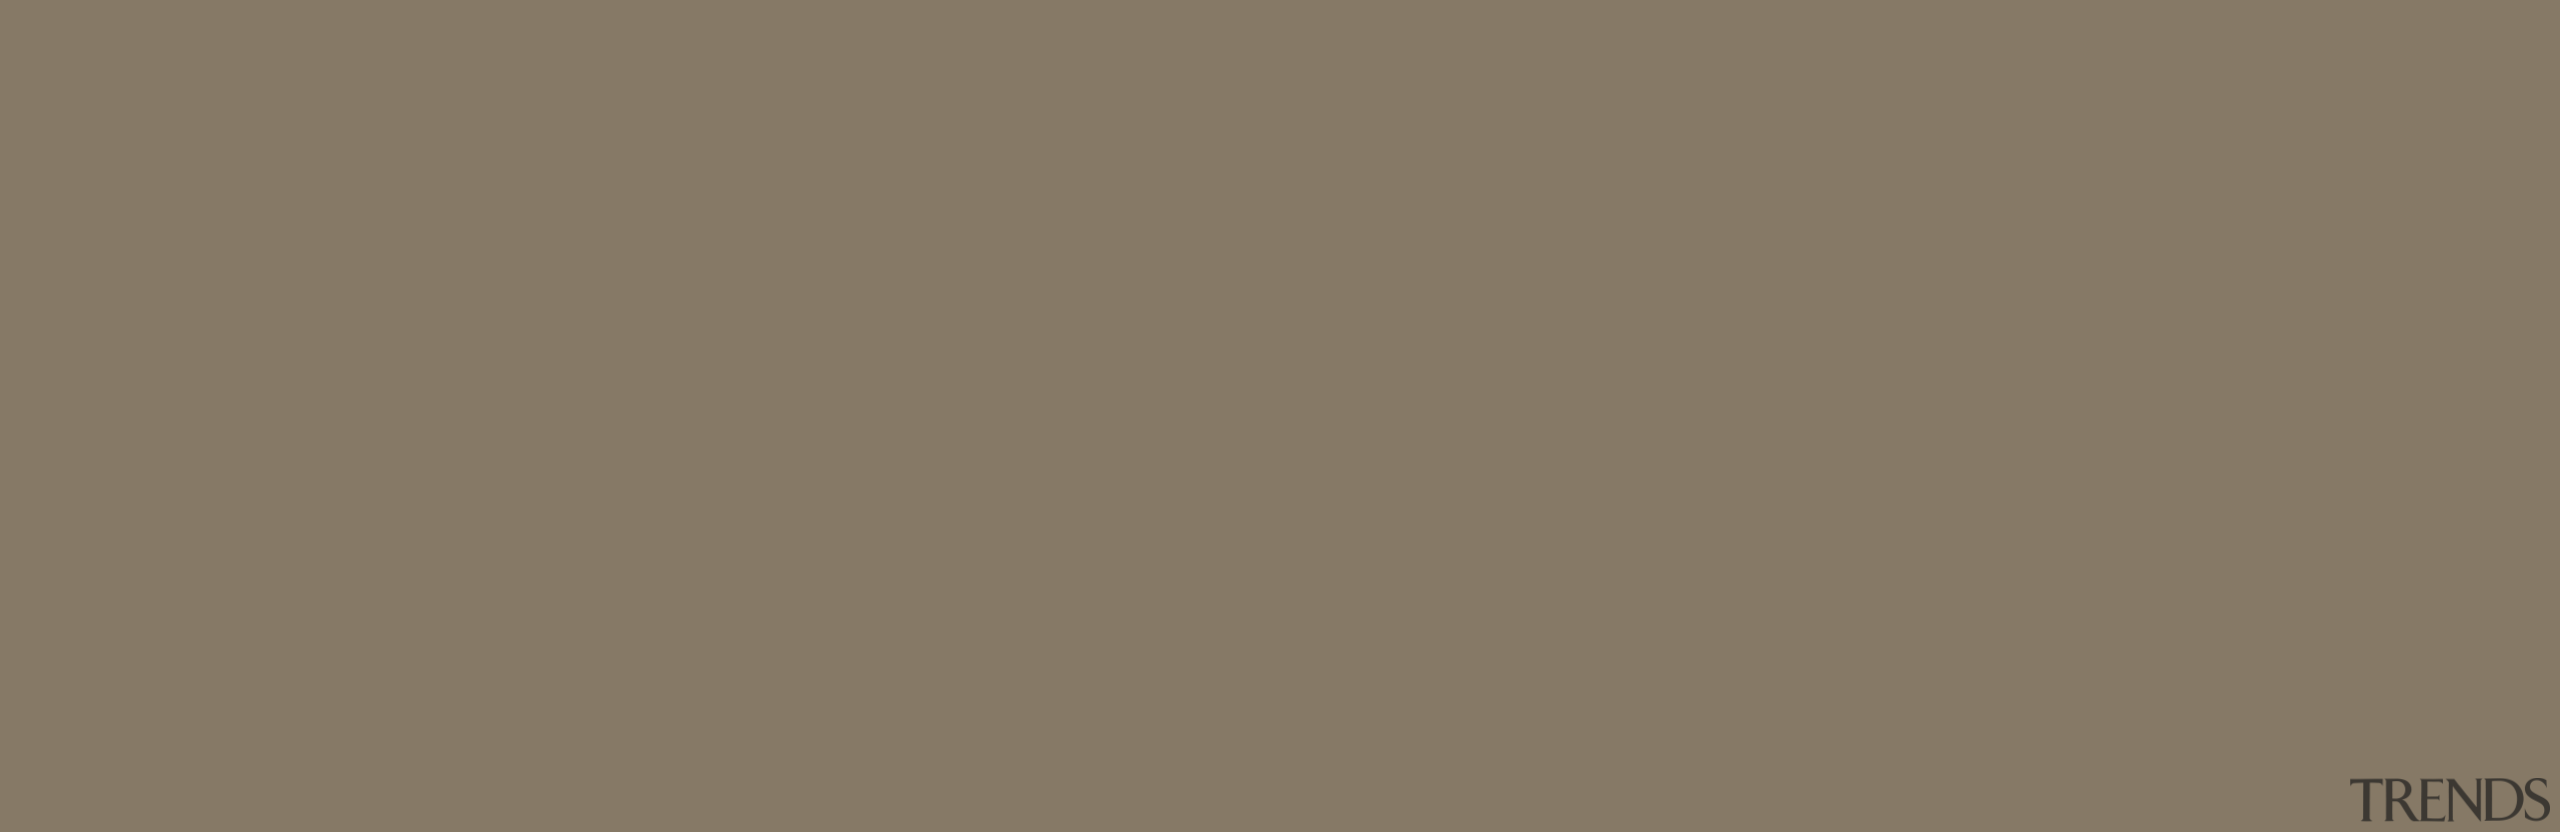 Moka - brown | font | line | brown, font, line, text, brown